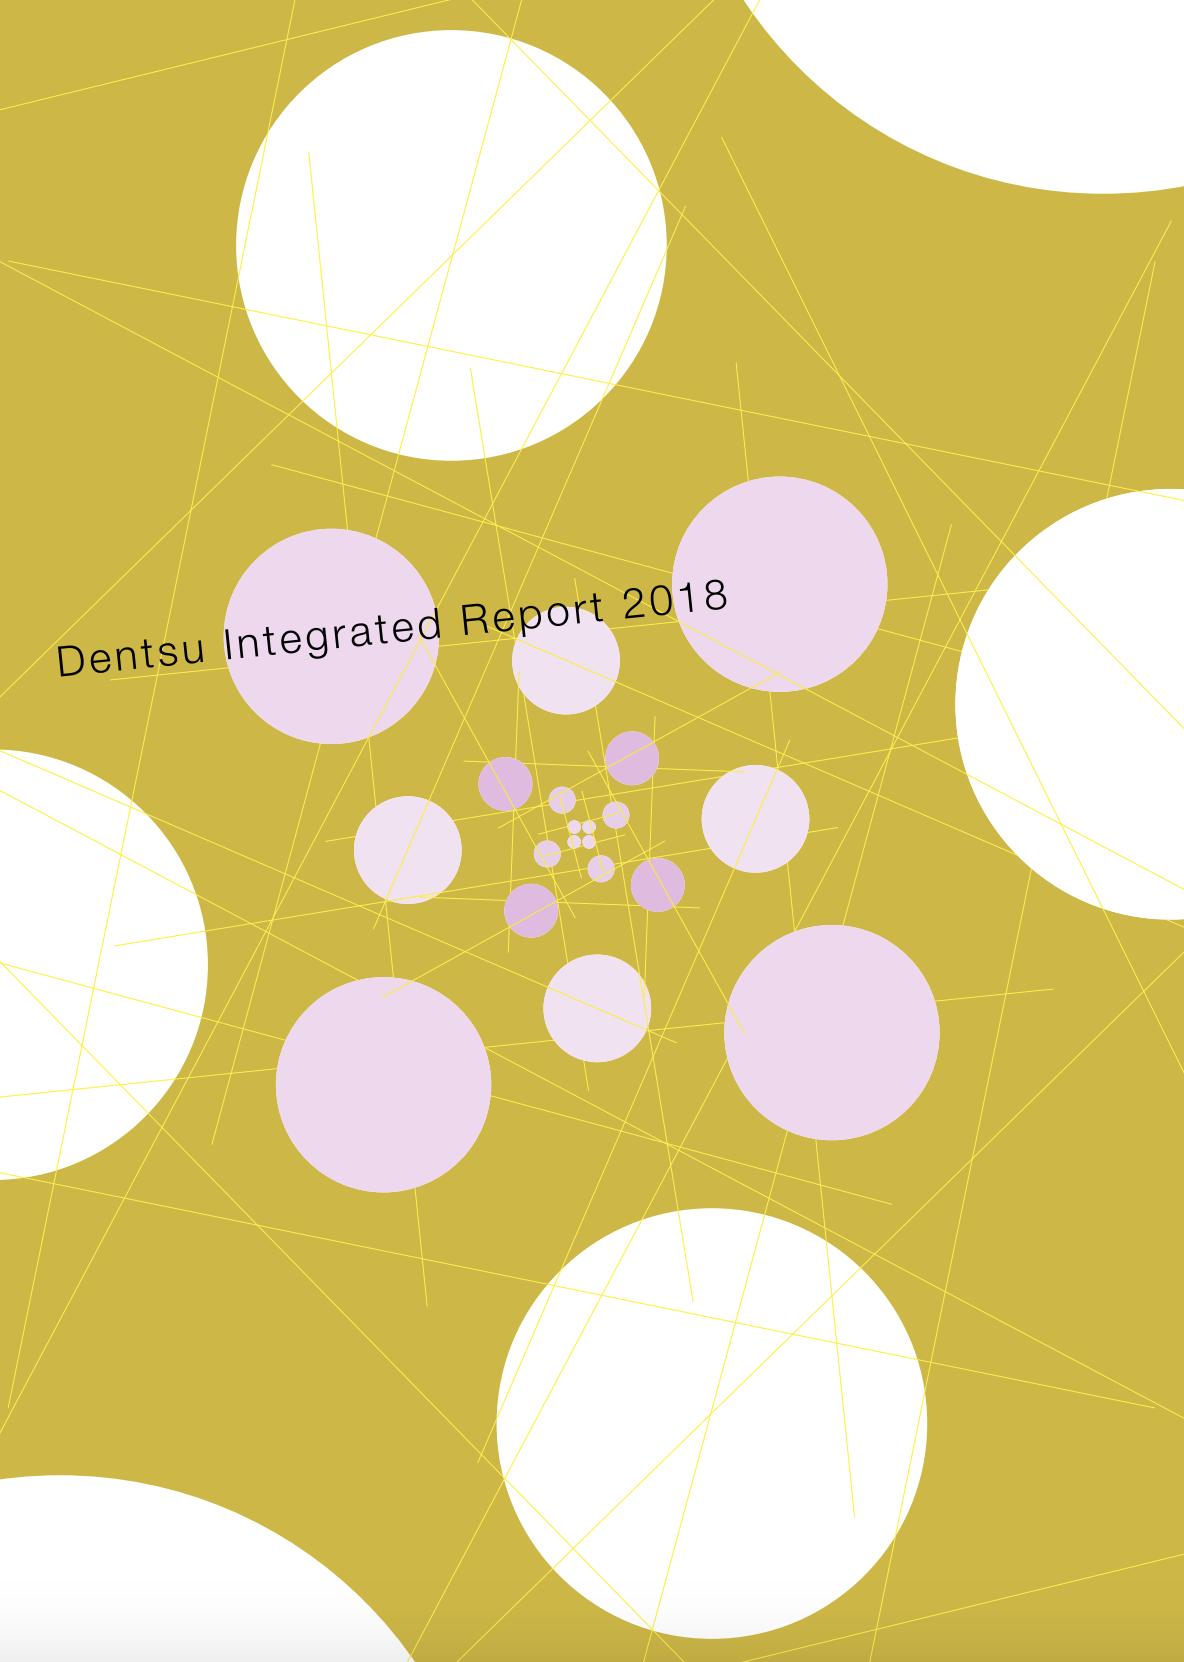 Dentsu Integrated Report 2018